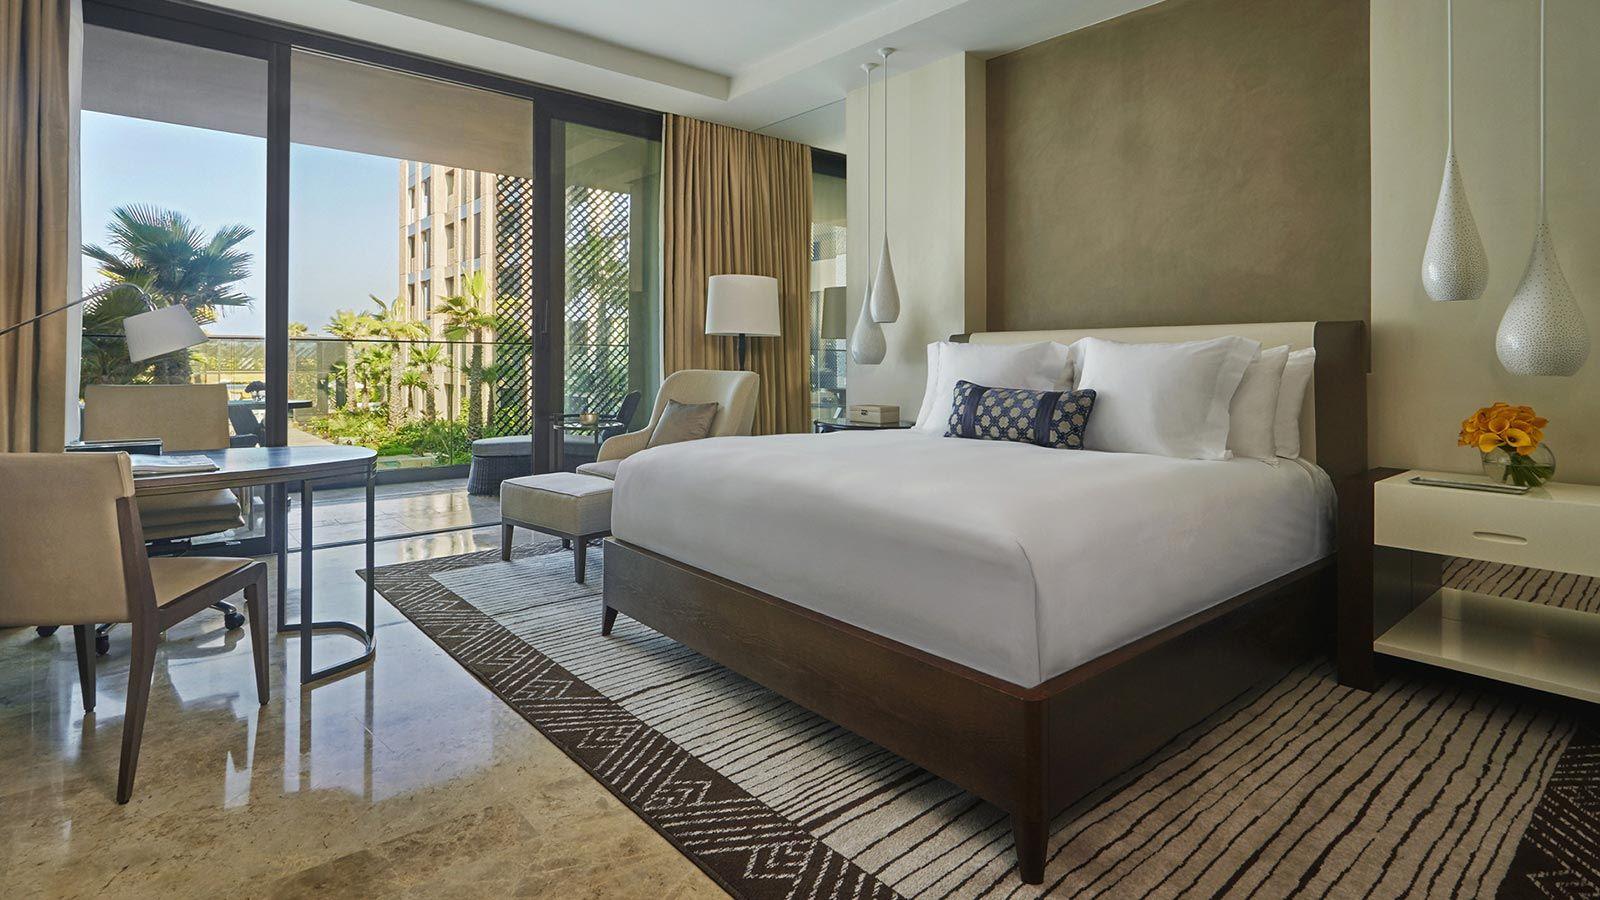 Casablanca Four Seasons Hotel, Modern Bedroom - Mace Group